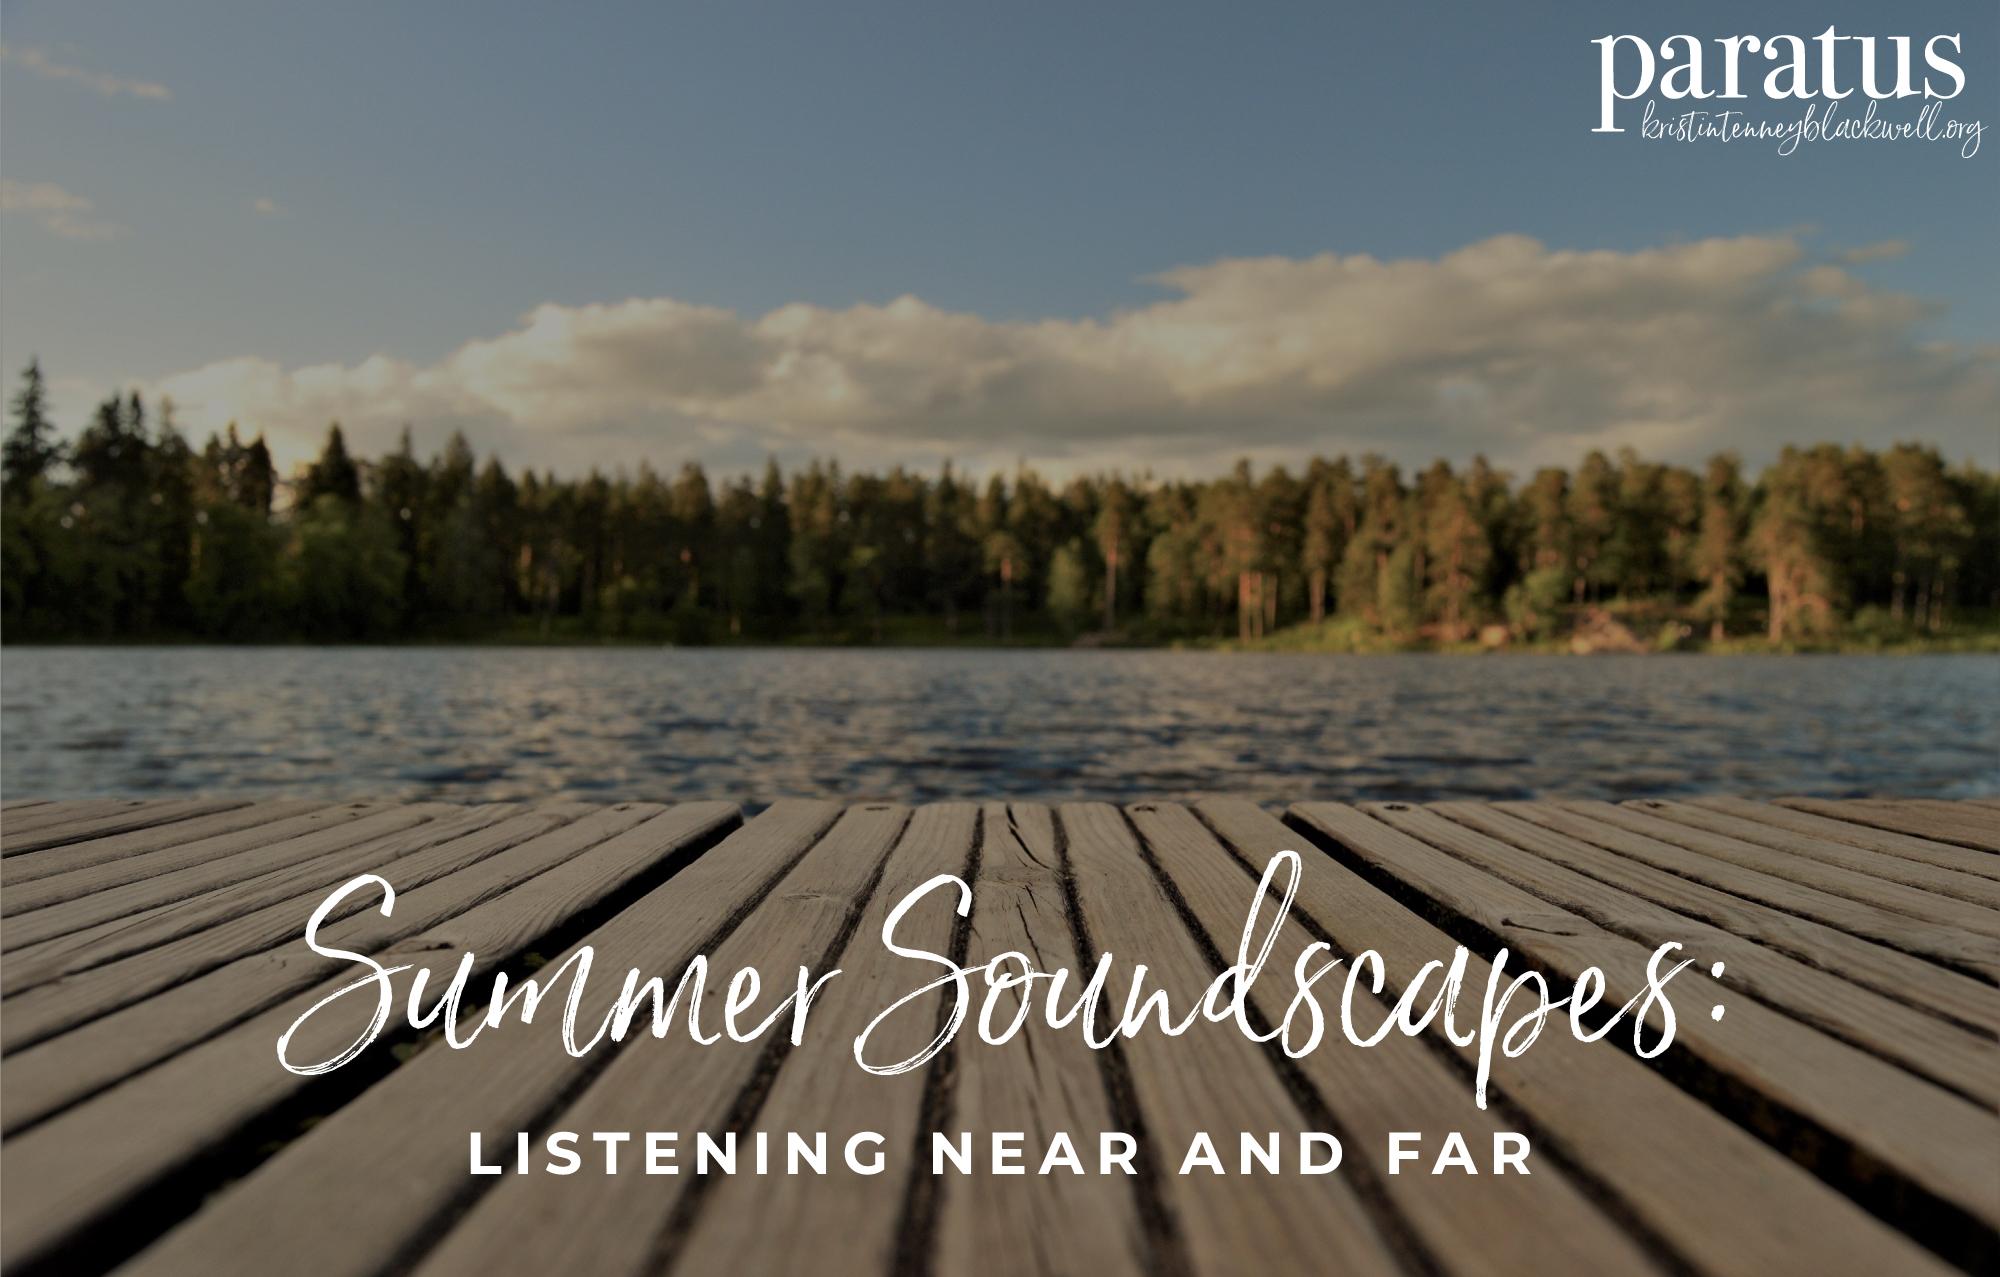 Summer soundscape on a lake